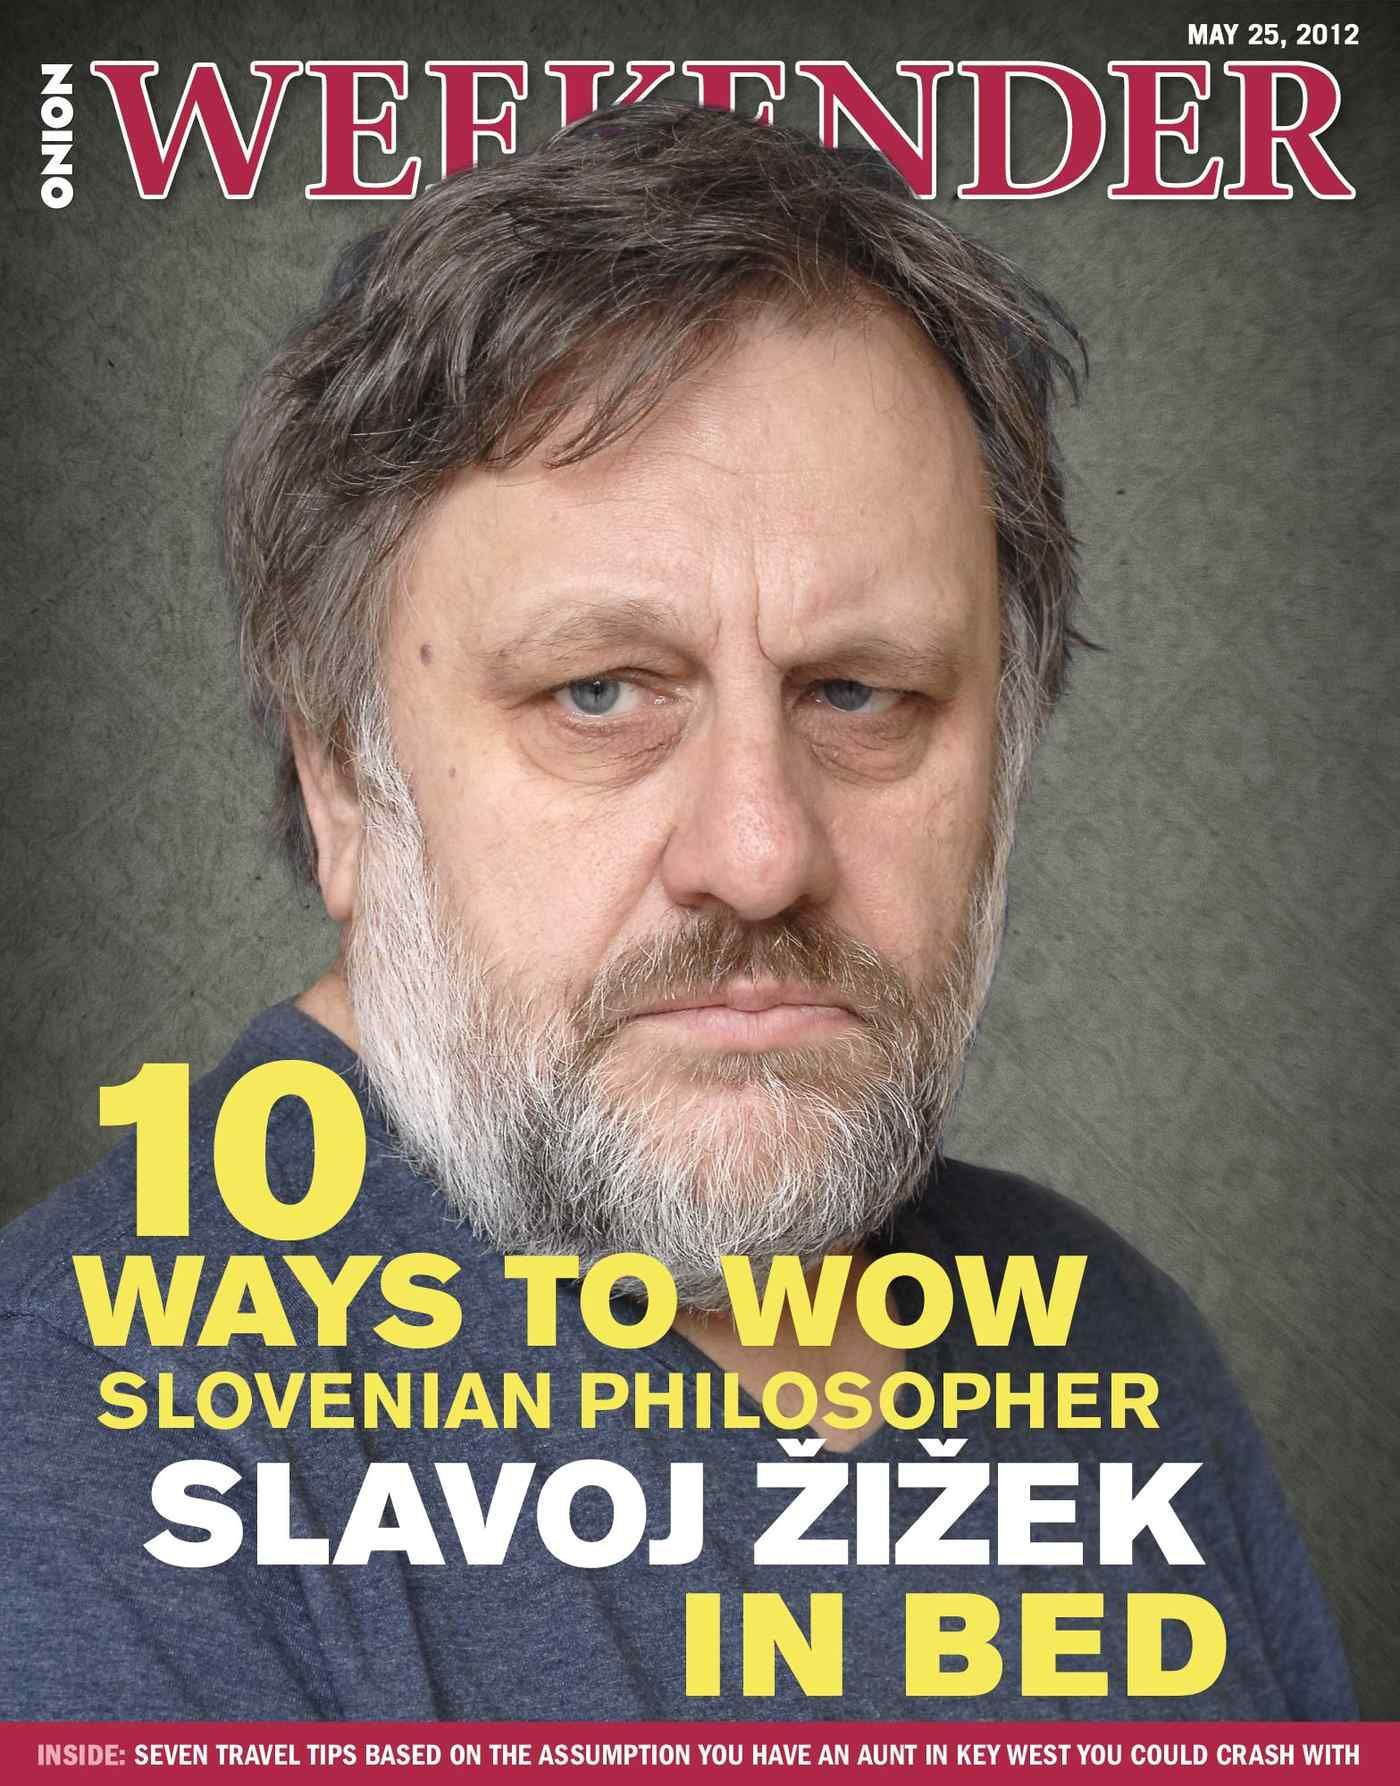 Ways To Wow Slovenian Philosopher Slavoj iek In Bed